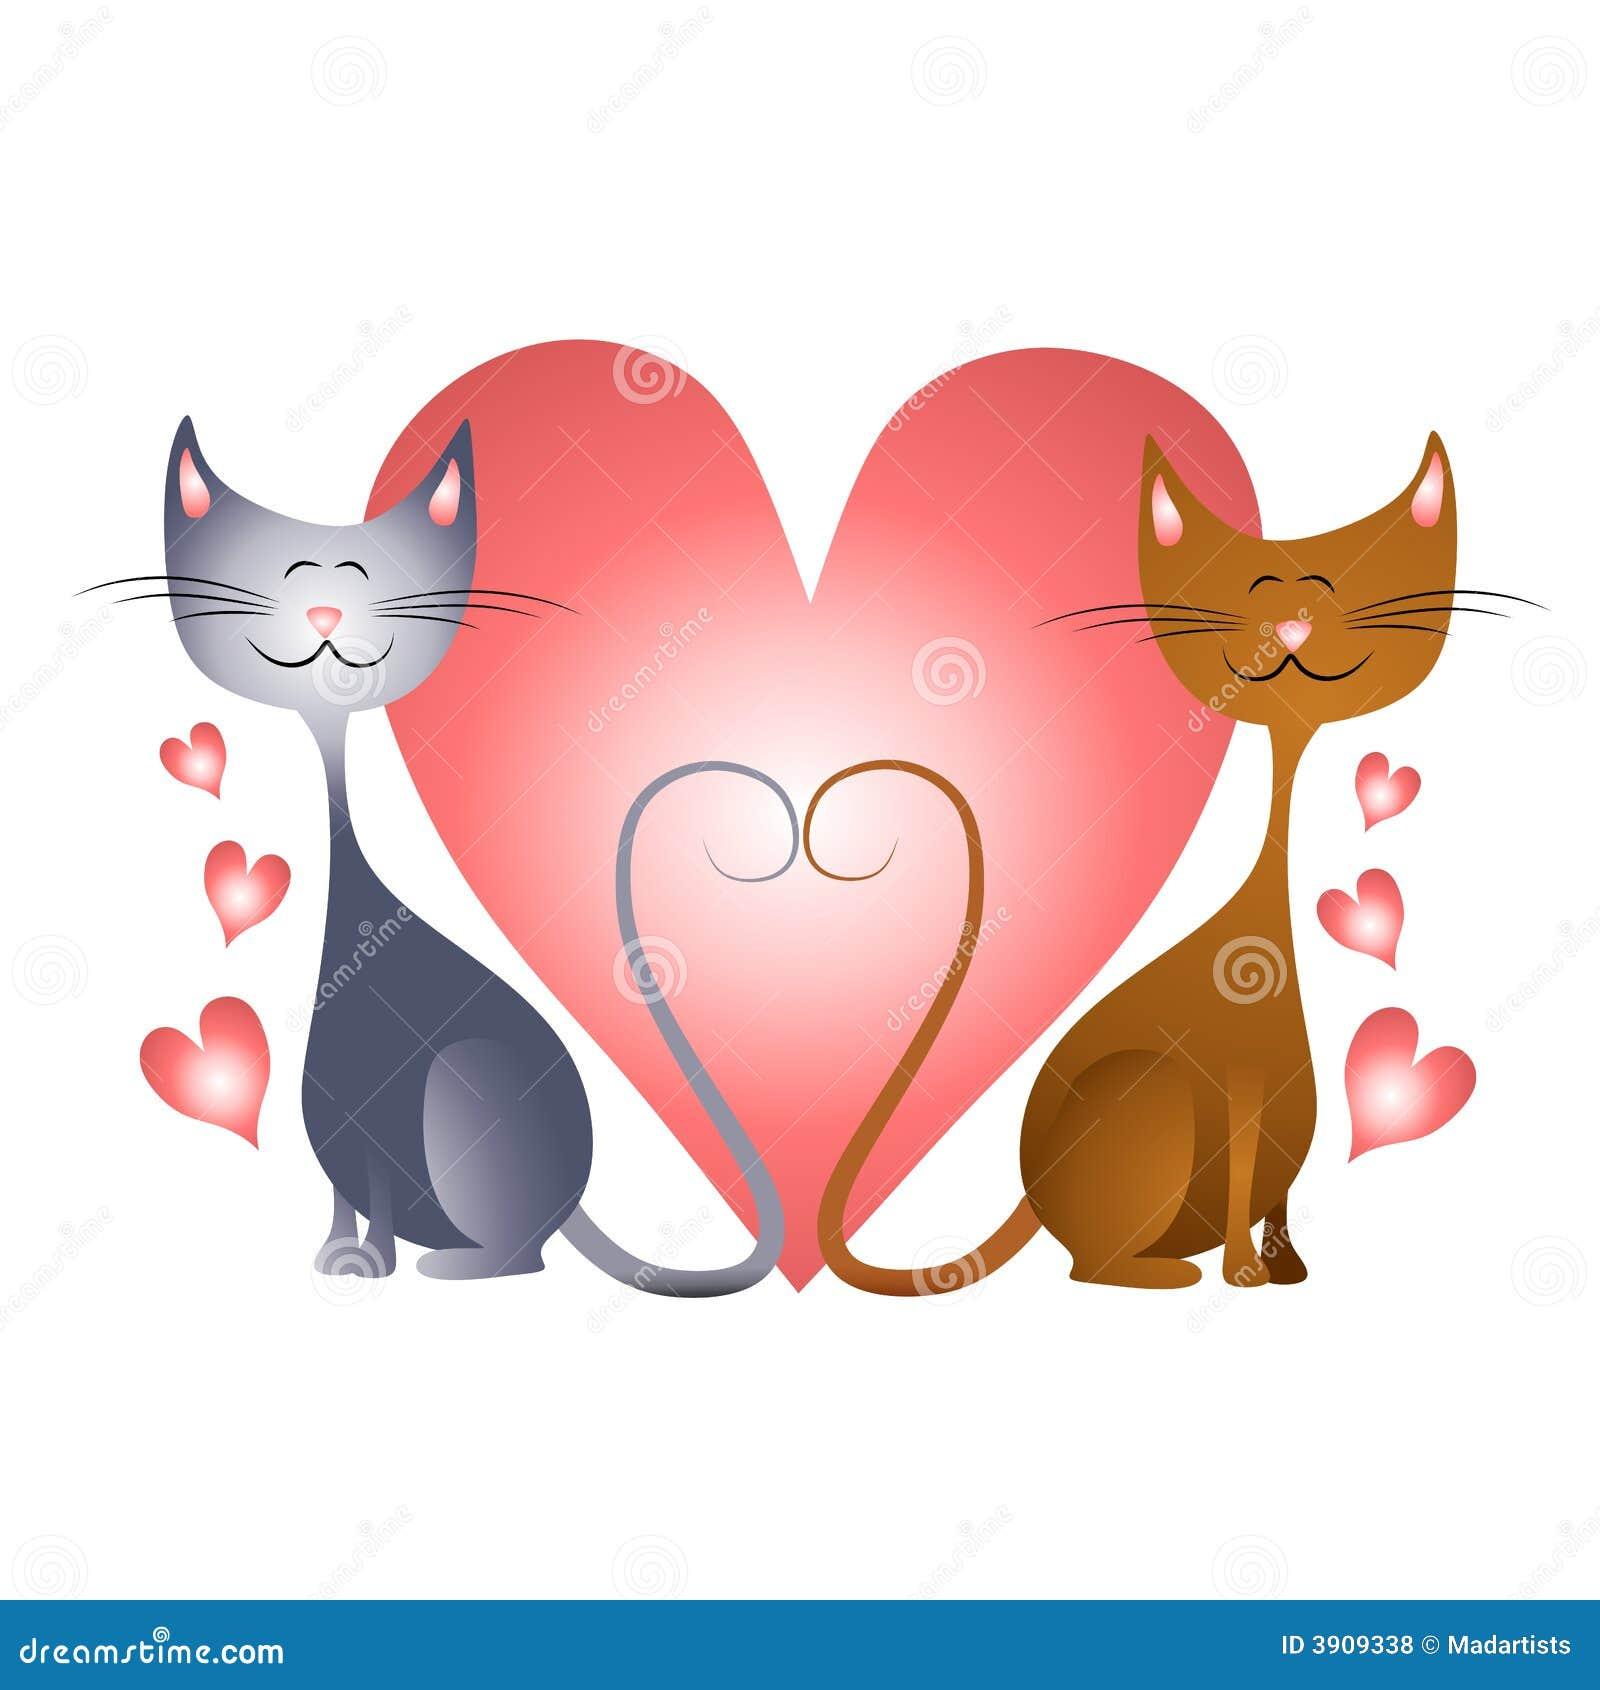 cat heart clipart - photo #44